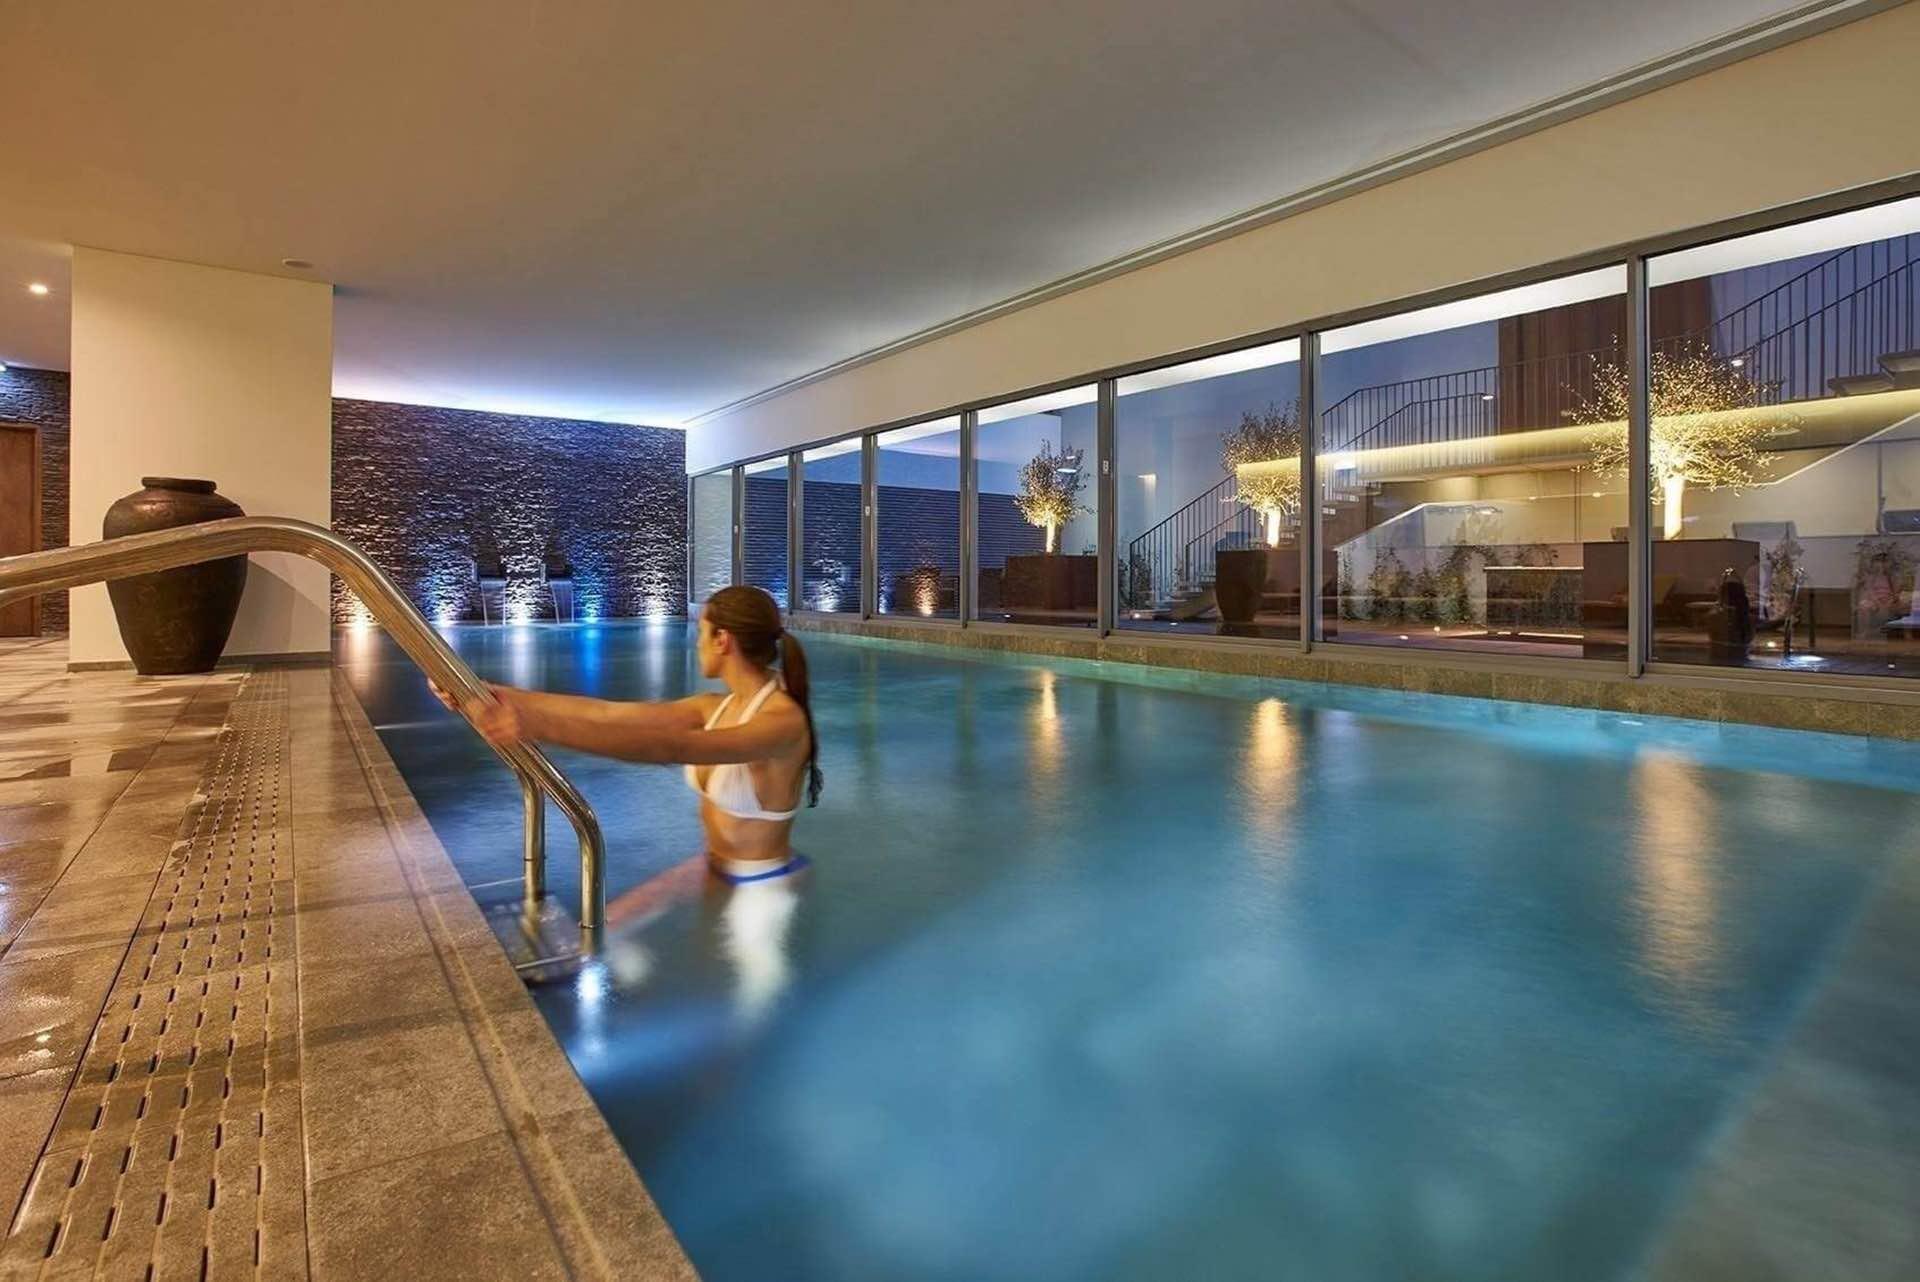 PortoBay Liberdade swimming pool with woman exiting pool